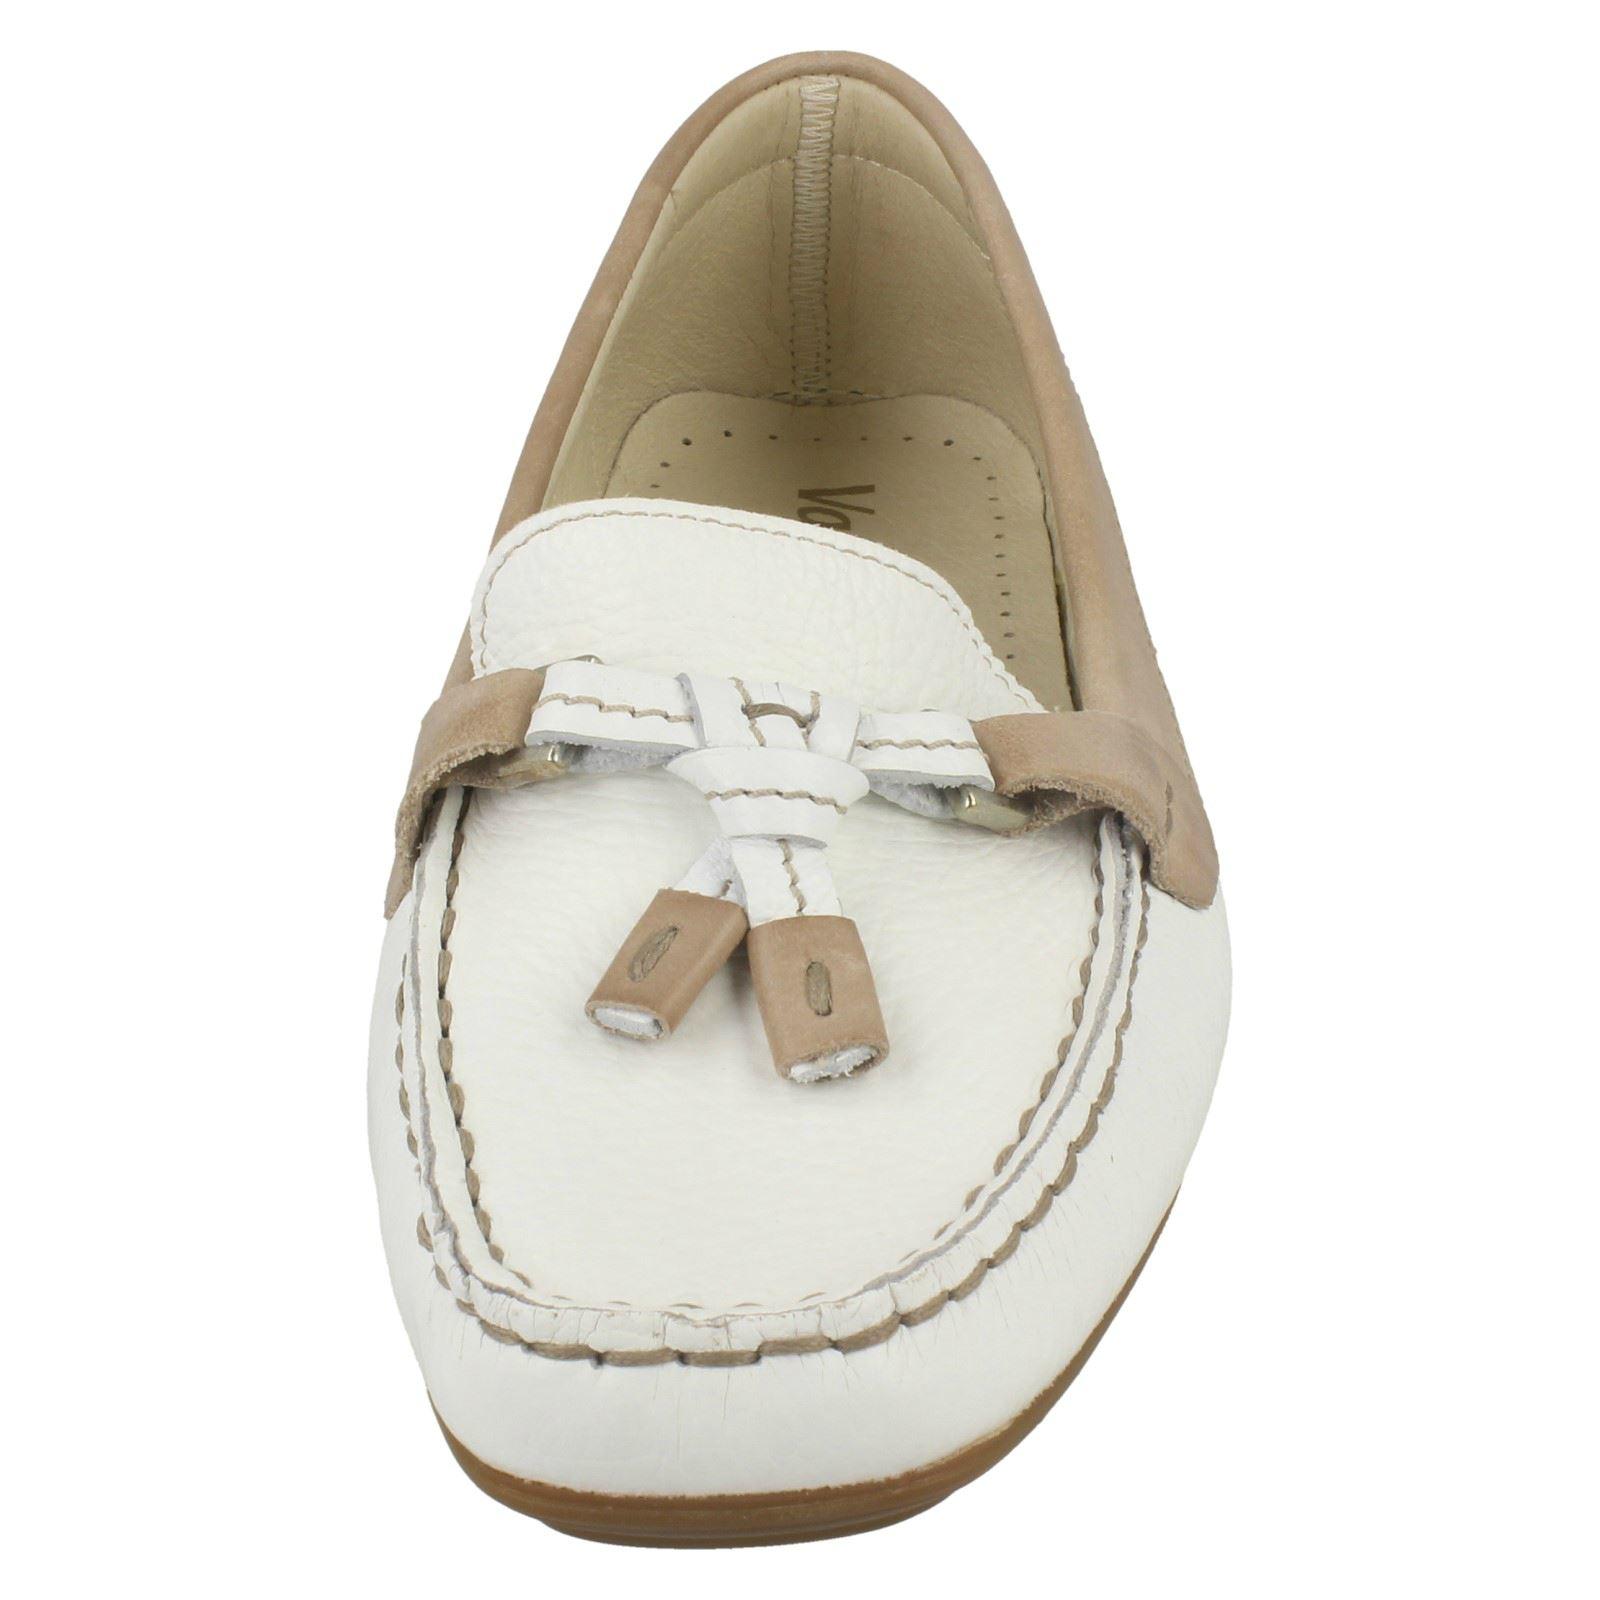 Ladies Van Dal Causal Loafer shoes With Tassle Detail 'Clovis' 'Clovis' 'Clovis' cc28f4